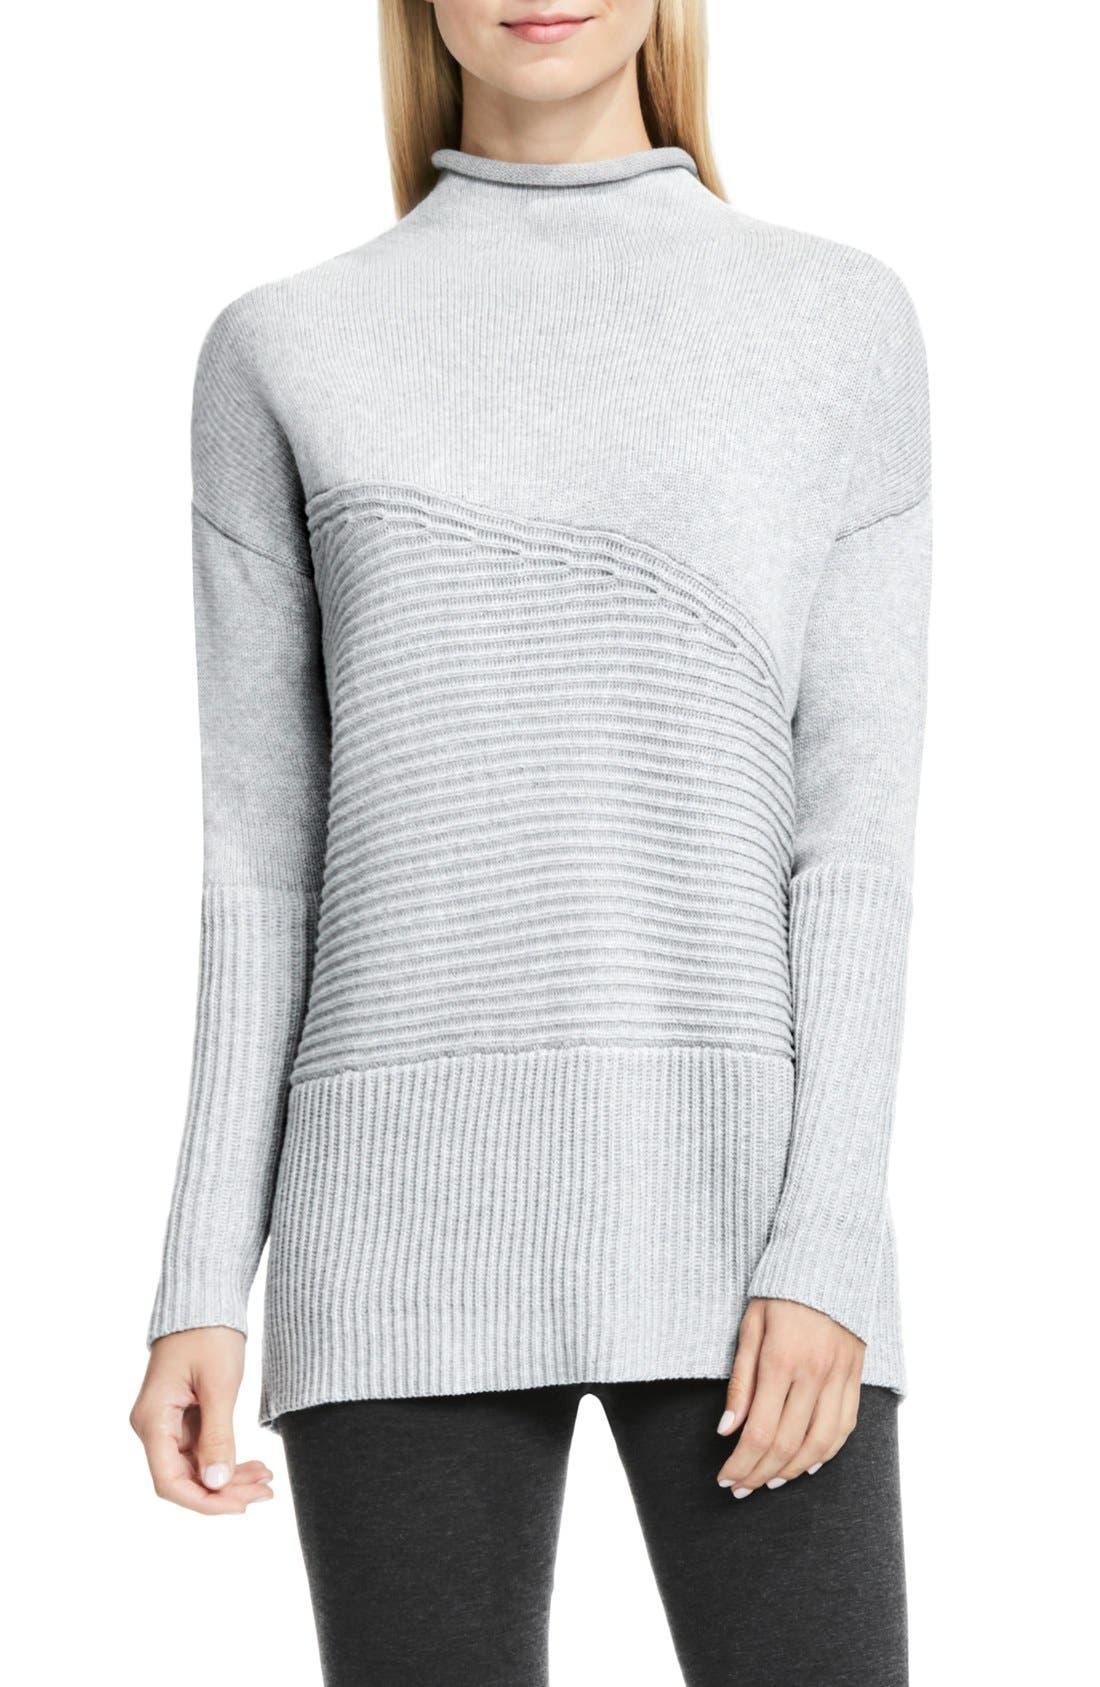 Main Image - Vince Camuto Rib Knit Turtleneck Sweater (Regular & Petite)